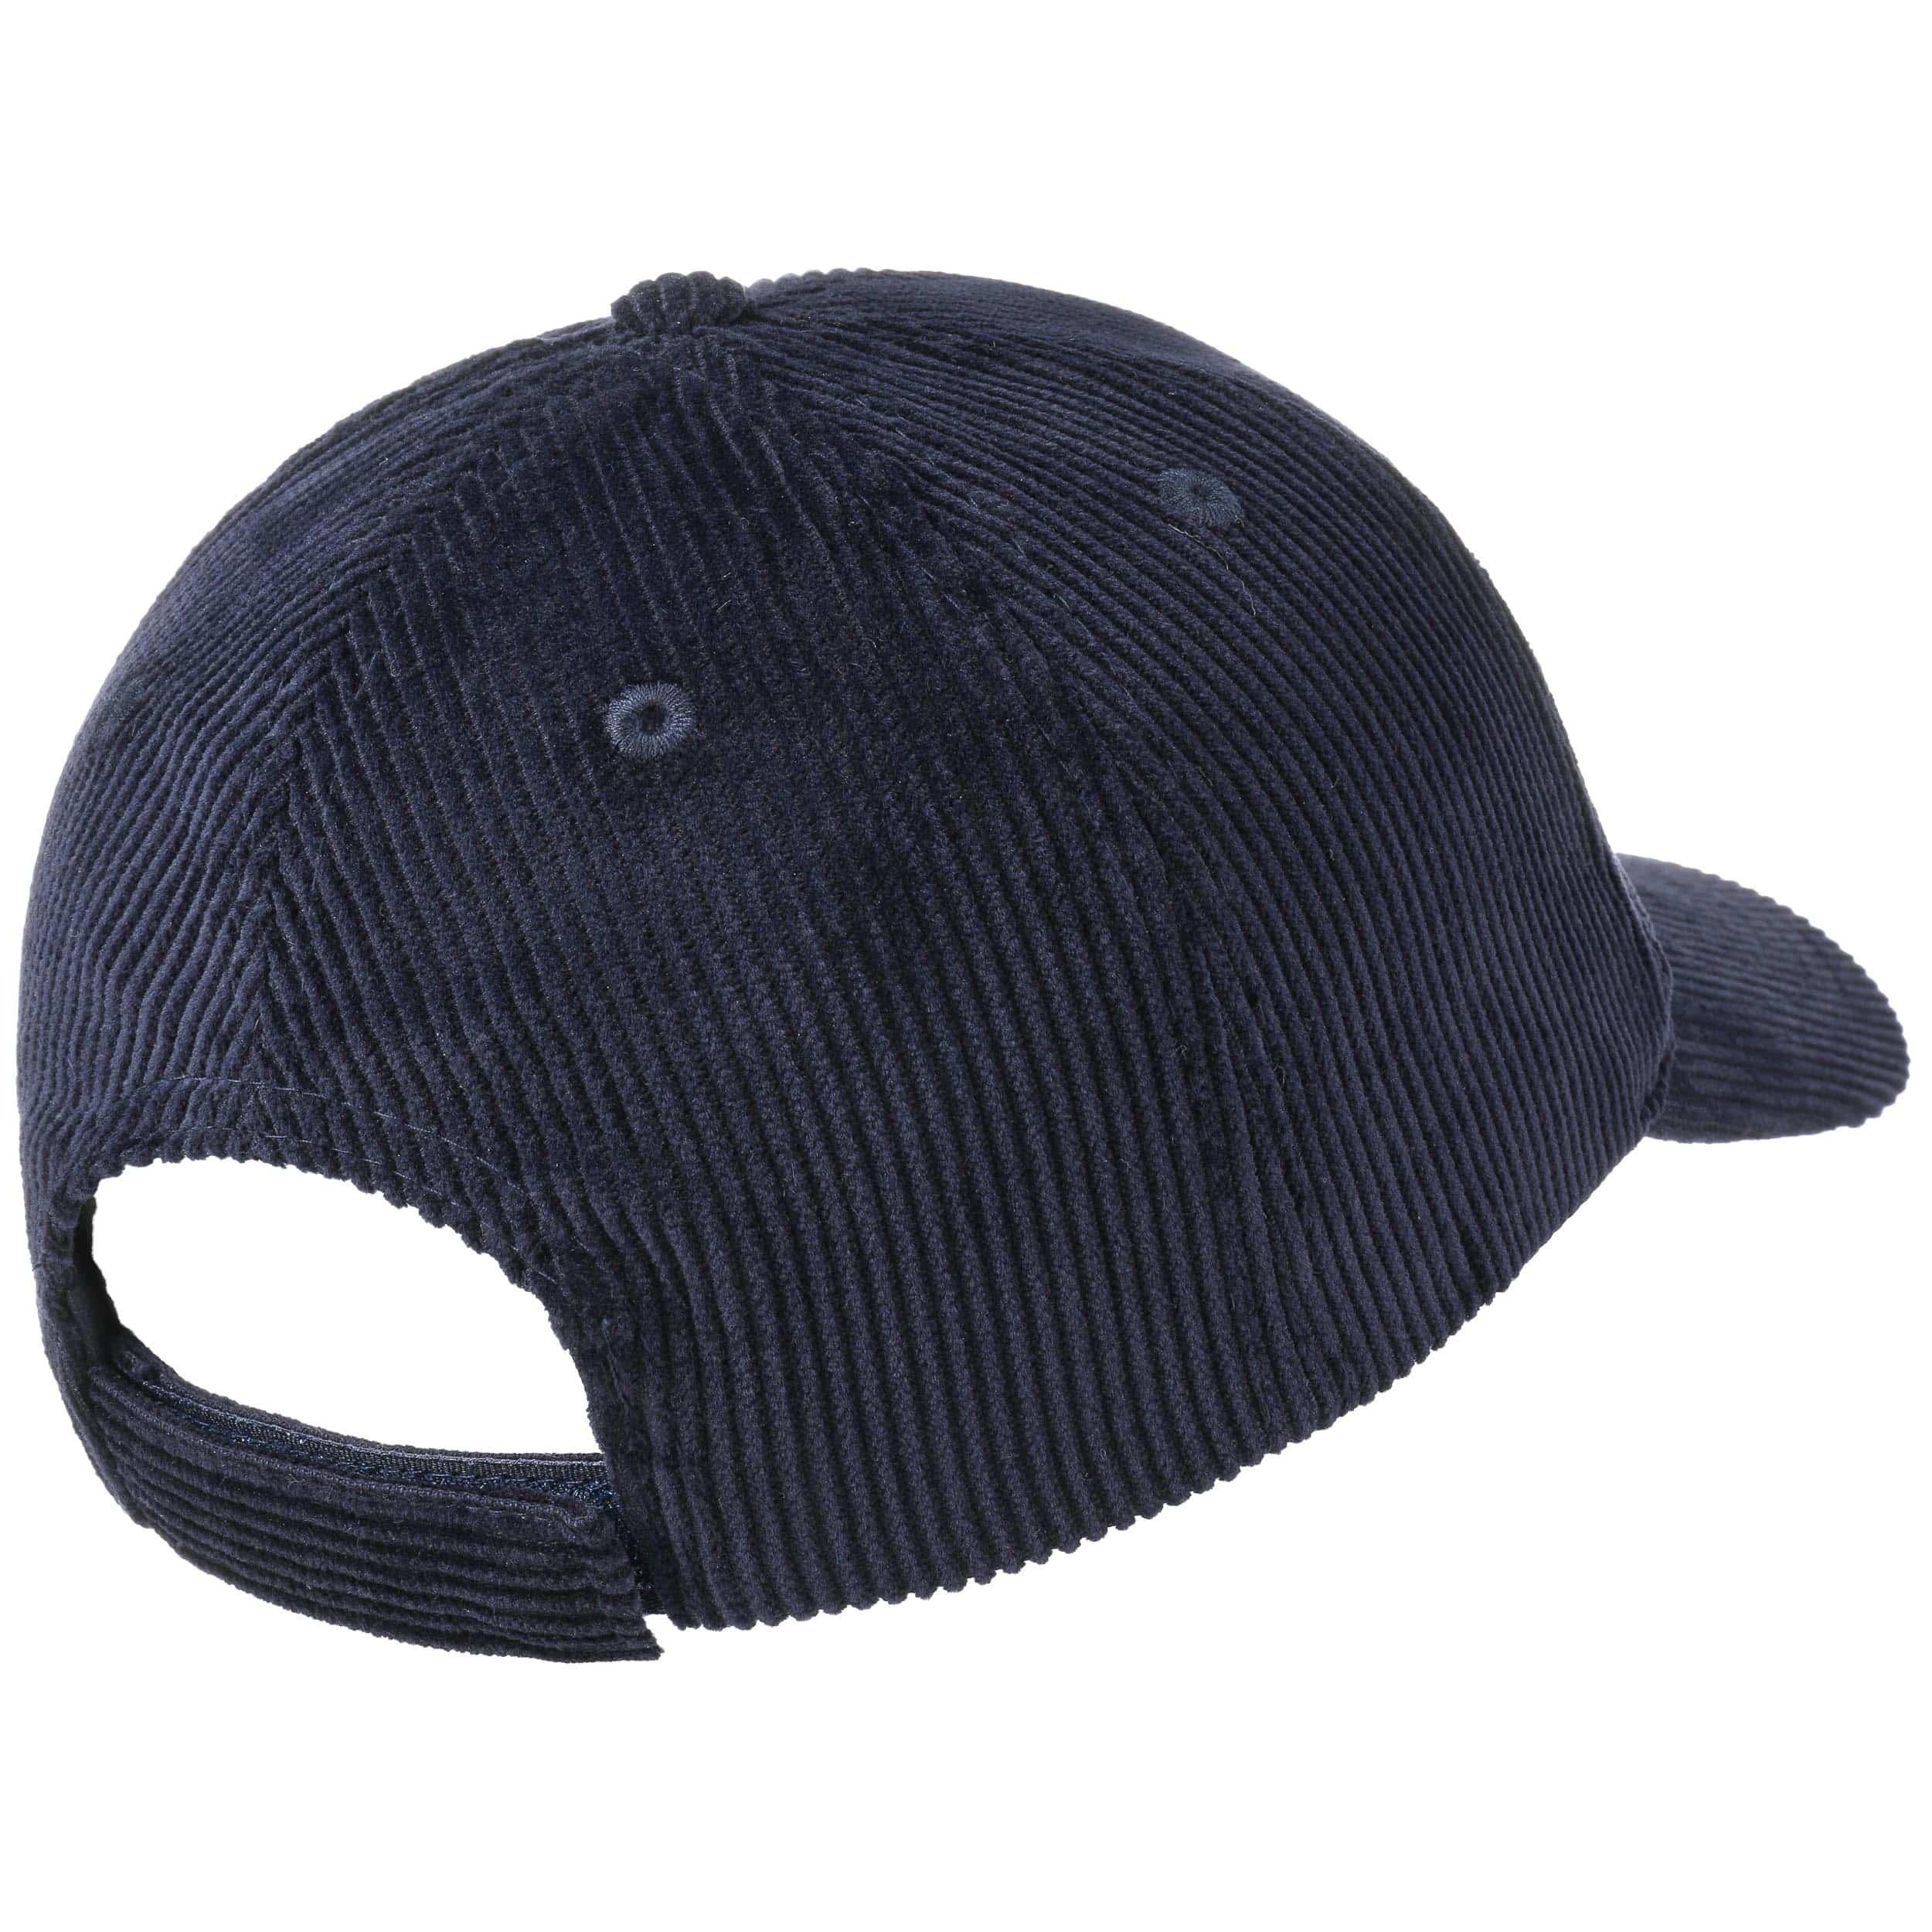 892dd52f157 Basic corduroy baseball cap eur hats caps beanies shop jpg 2500x2500 Corduroy  baseball cap